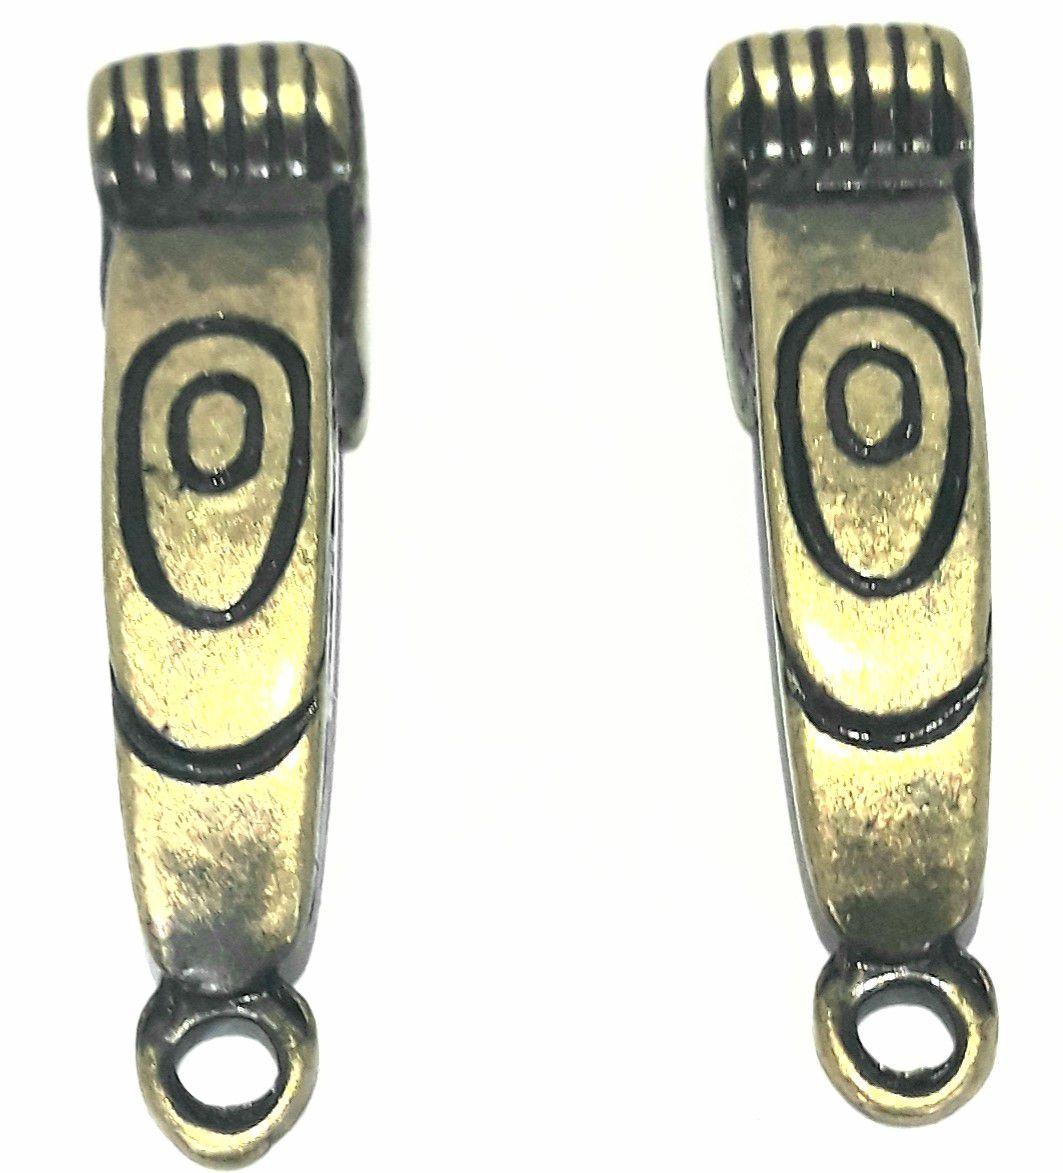 Pingente Maquina de Cortar Cabelo - PINGP76